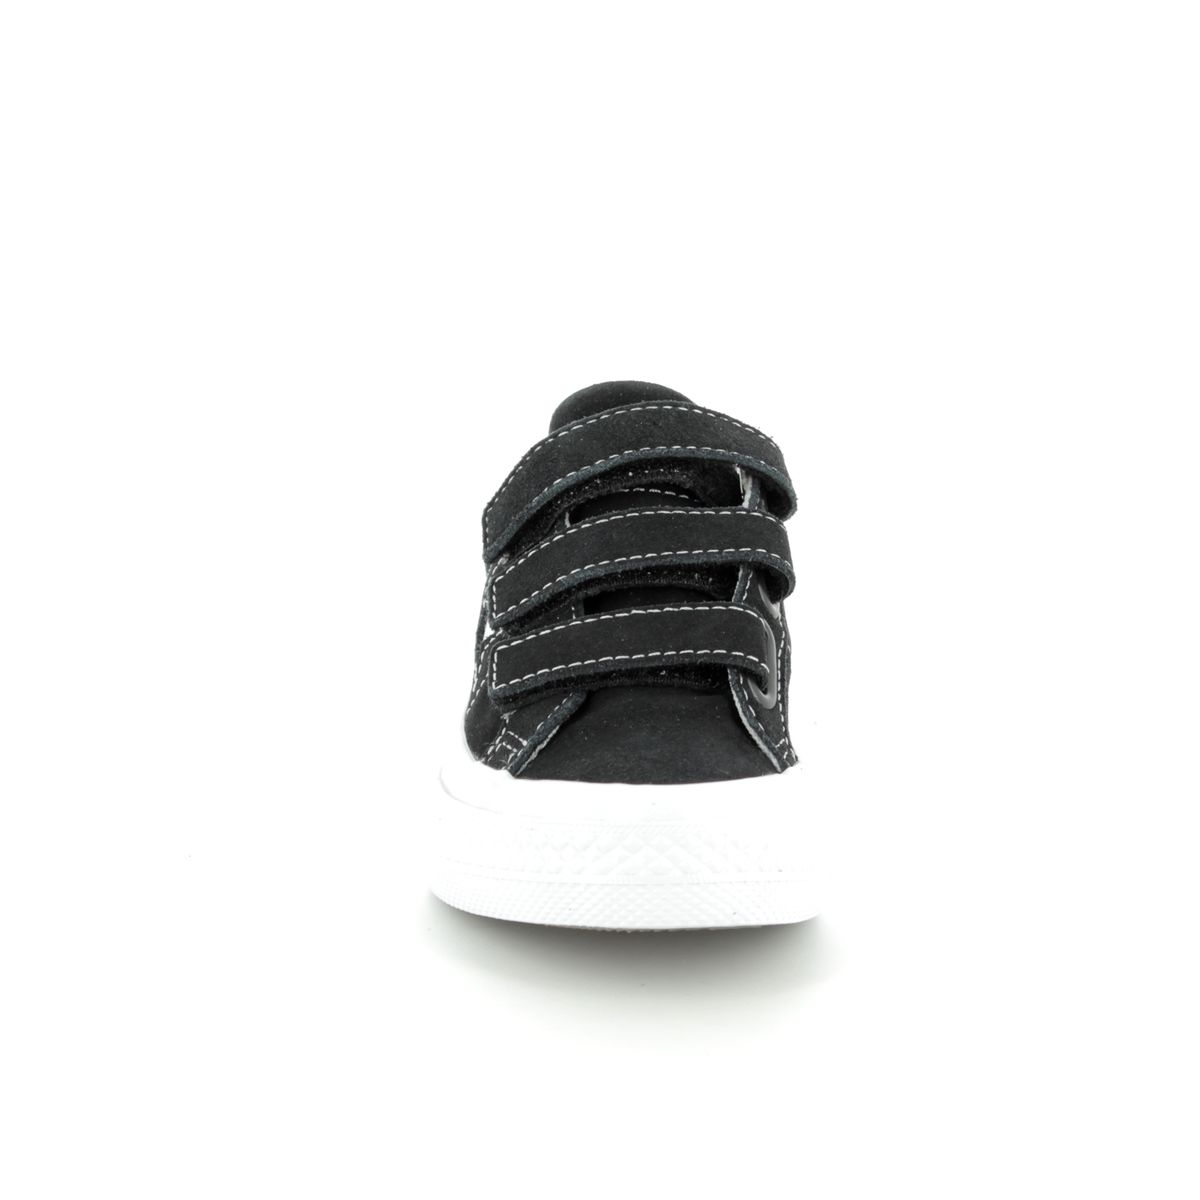 d185cba11fce Converse Onestar Velcro Junior 658491C Black Unisex Kids Trainers